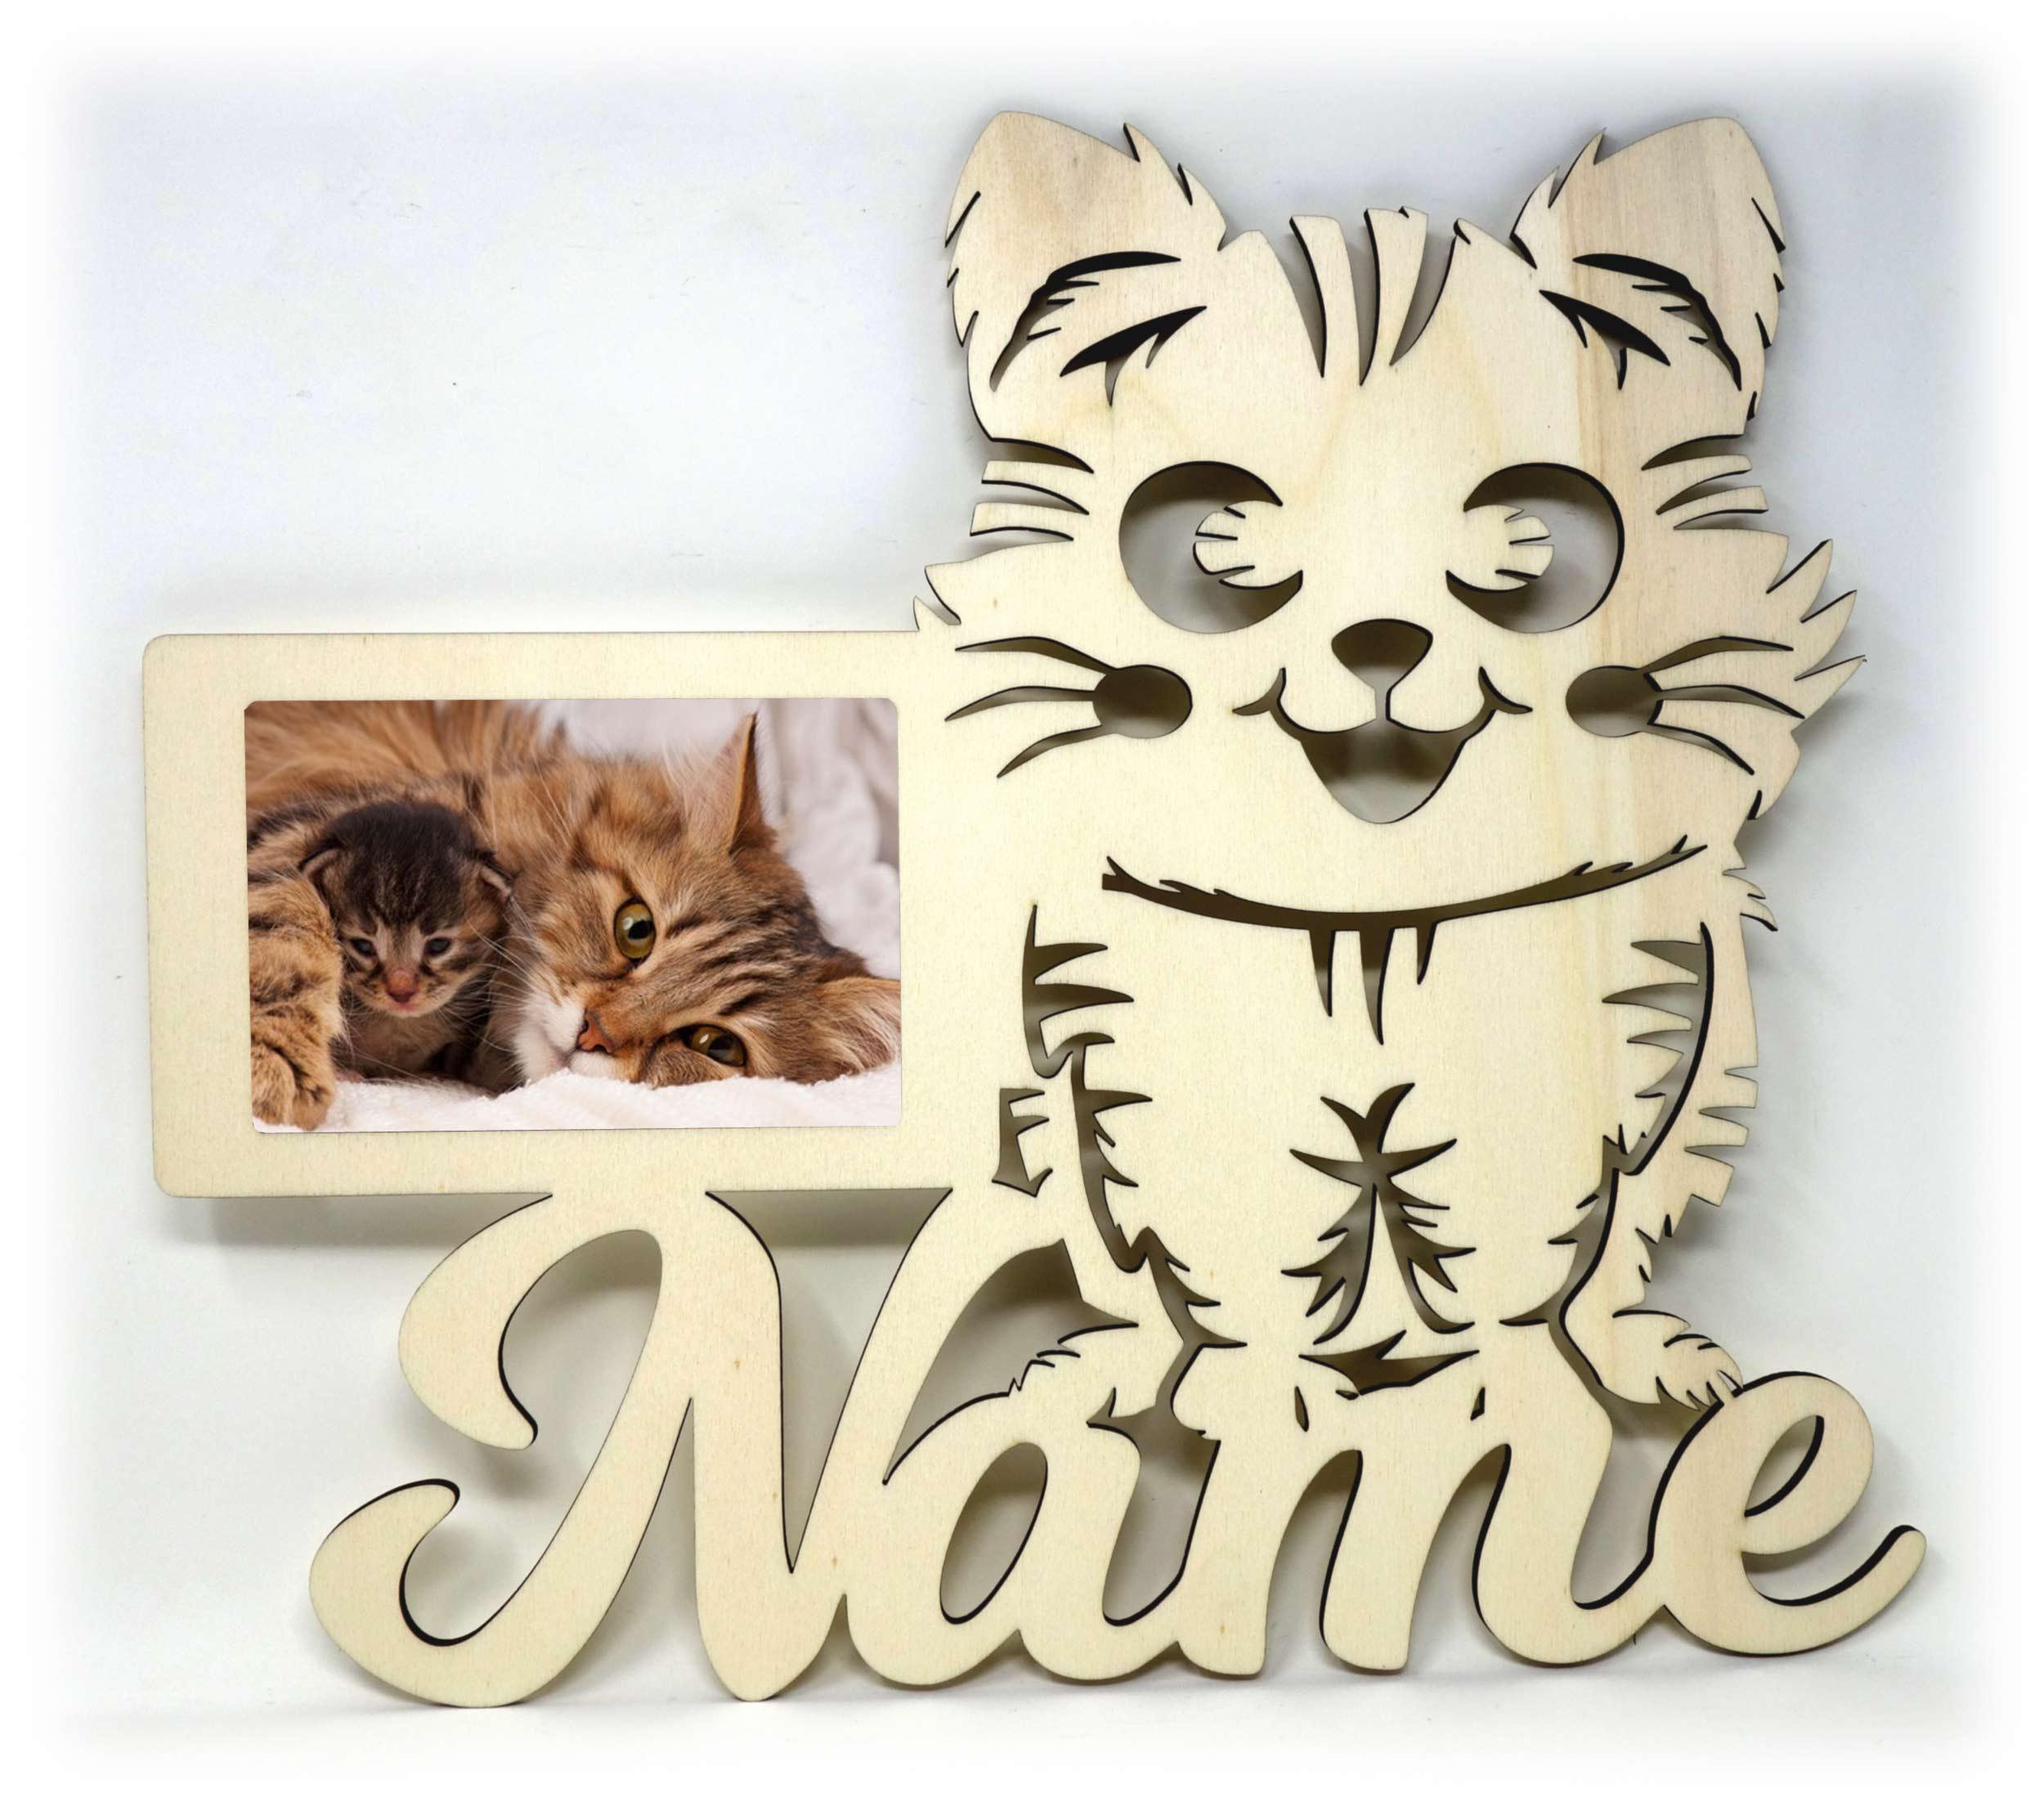 Geschenkidee Katzen Bilderrahmen individuell mit Namen ...